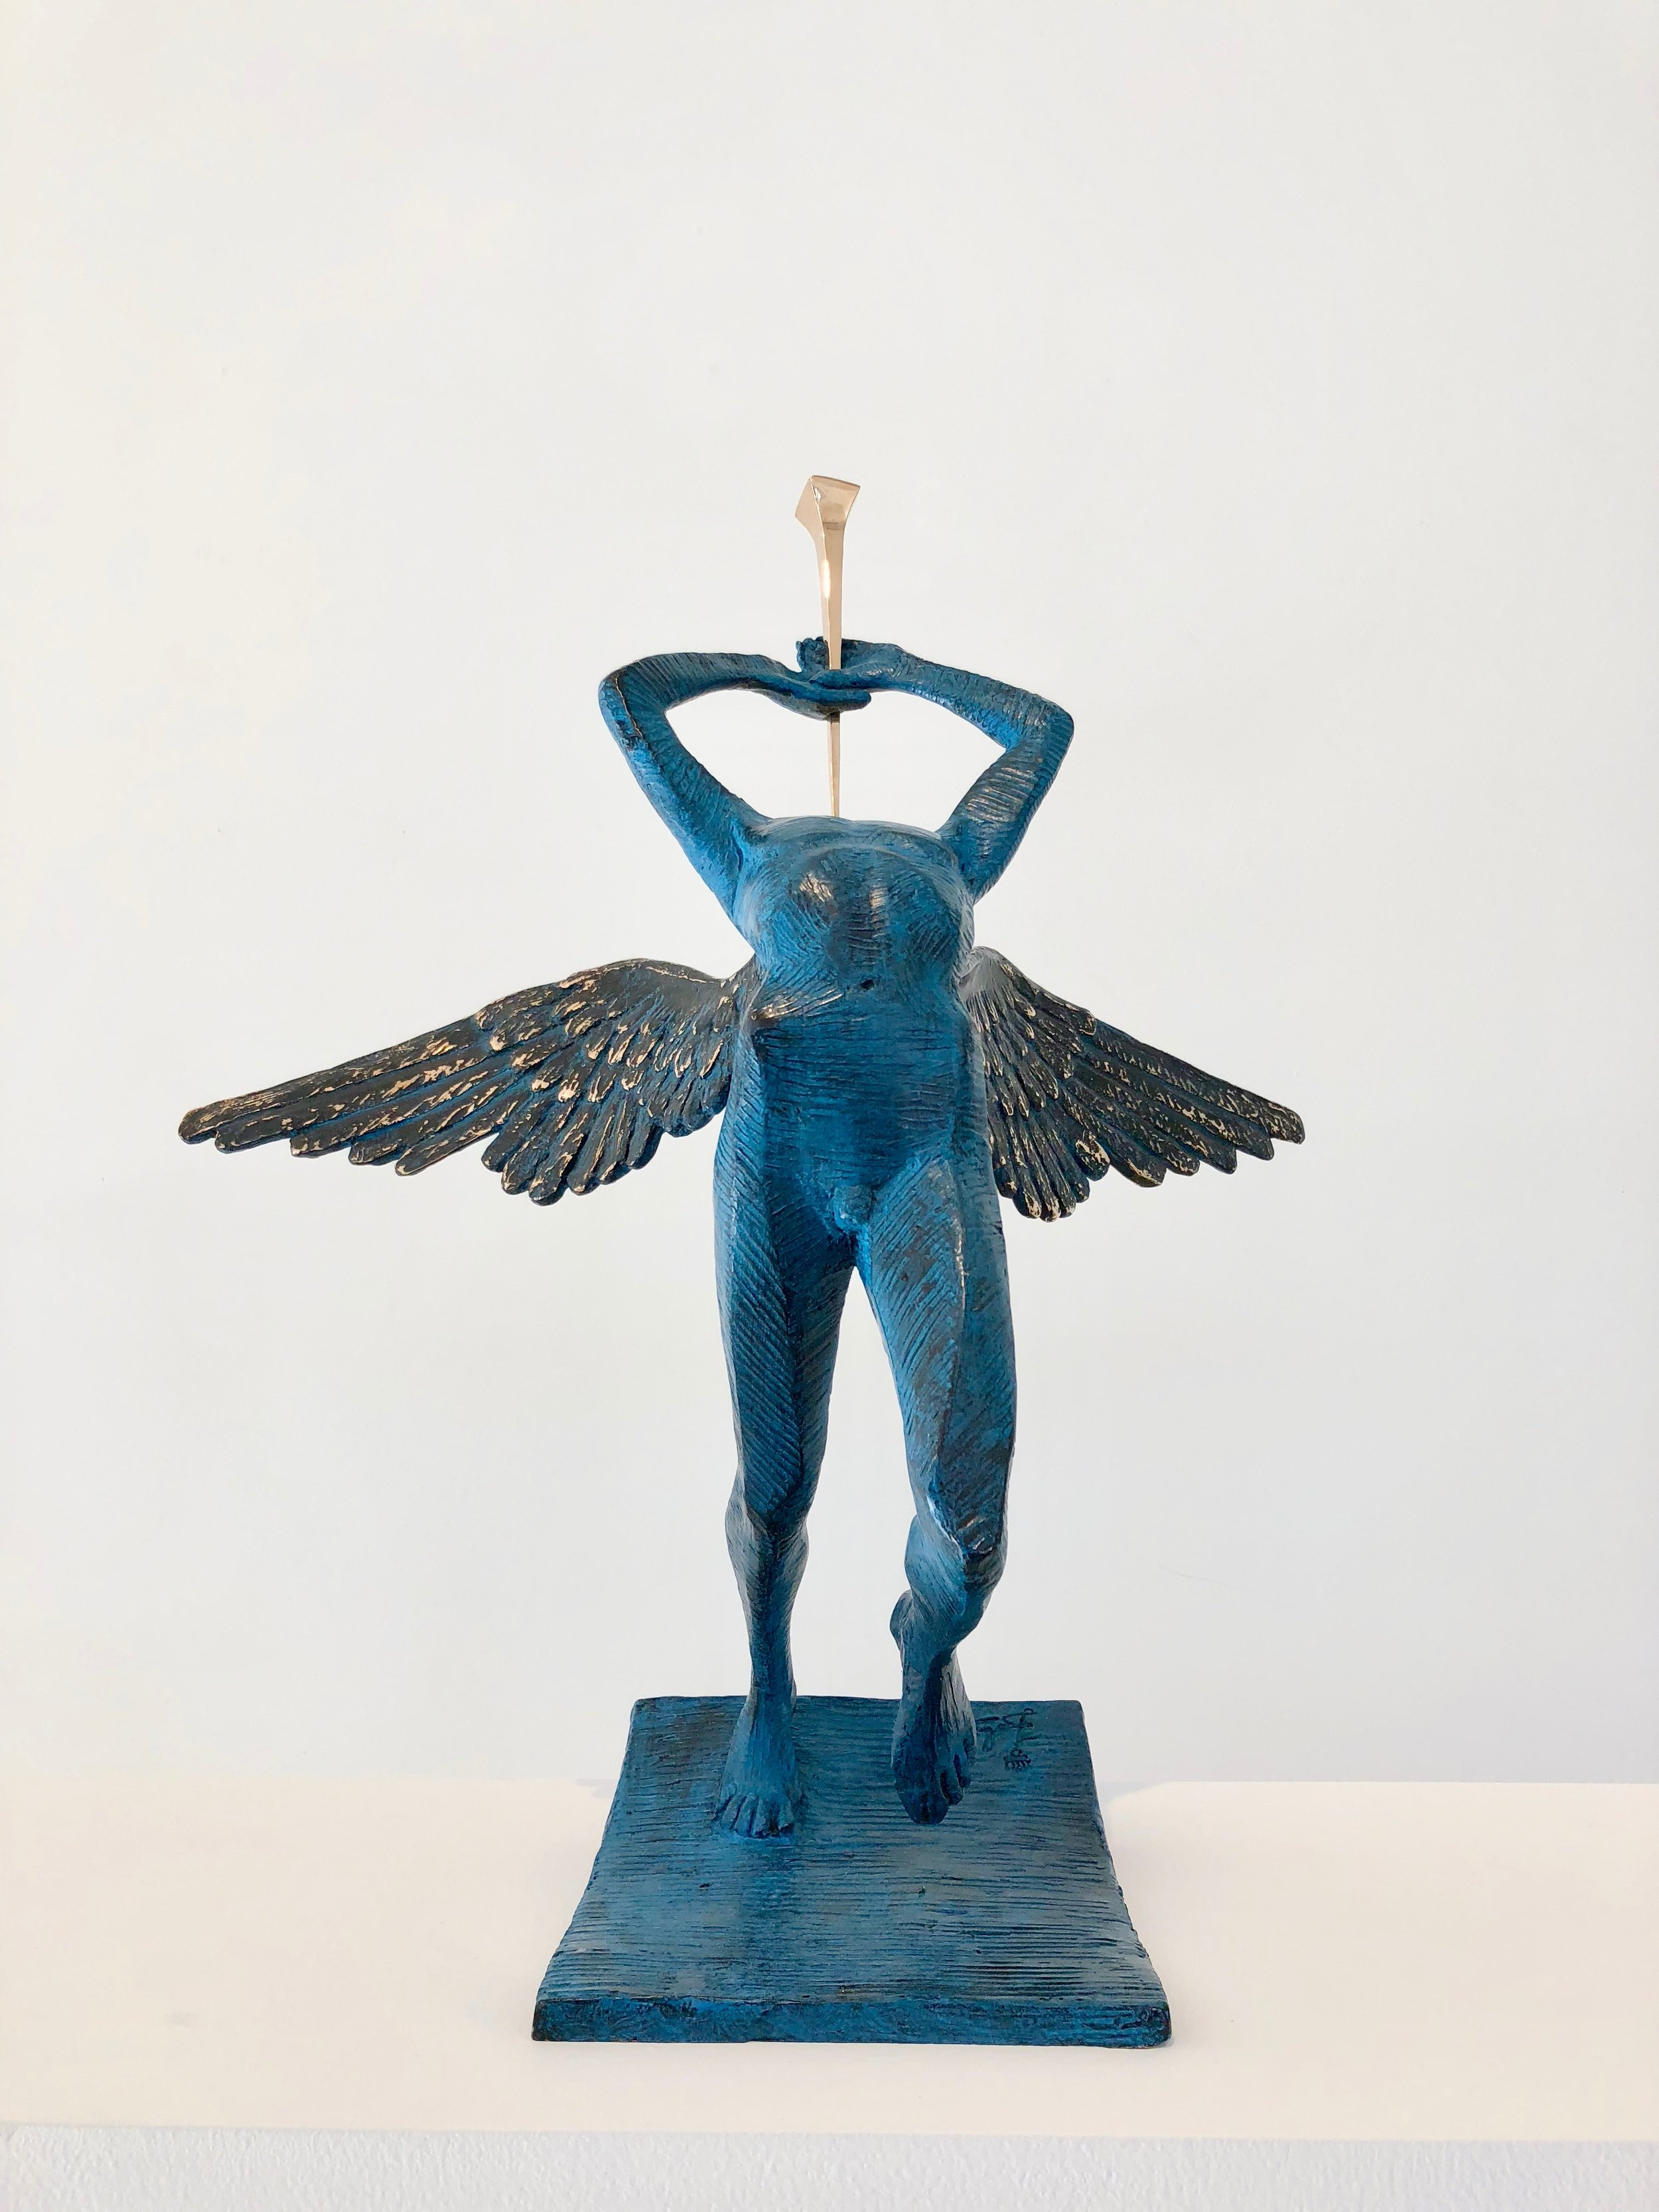 Triumphant Angel , 1976-1984 Bronze 19 87/127h x 6 63/127w x 7 11/127d inches